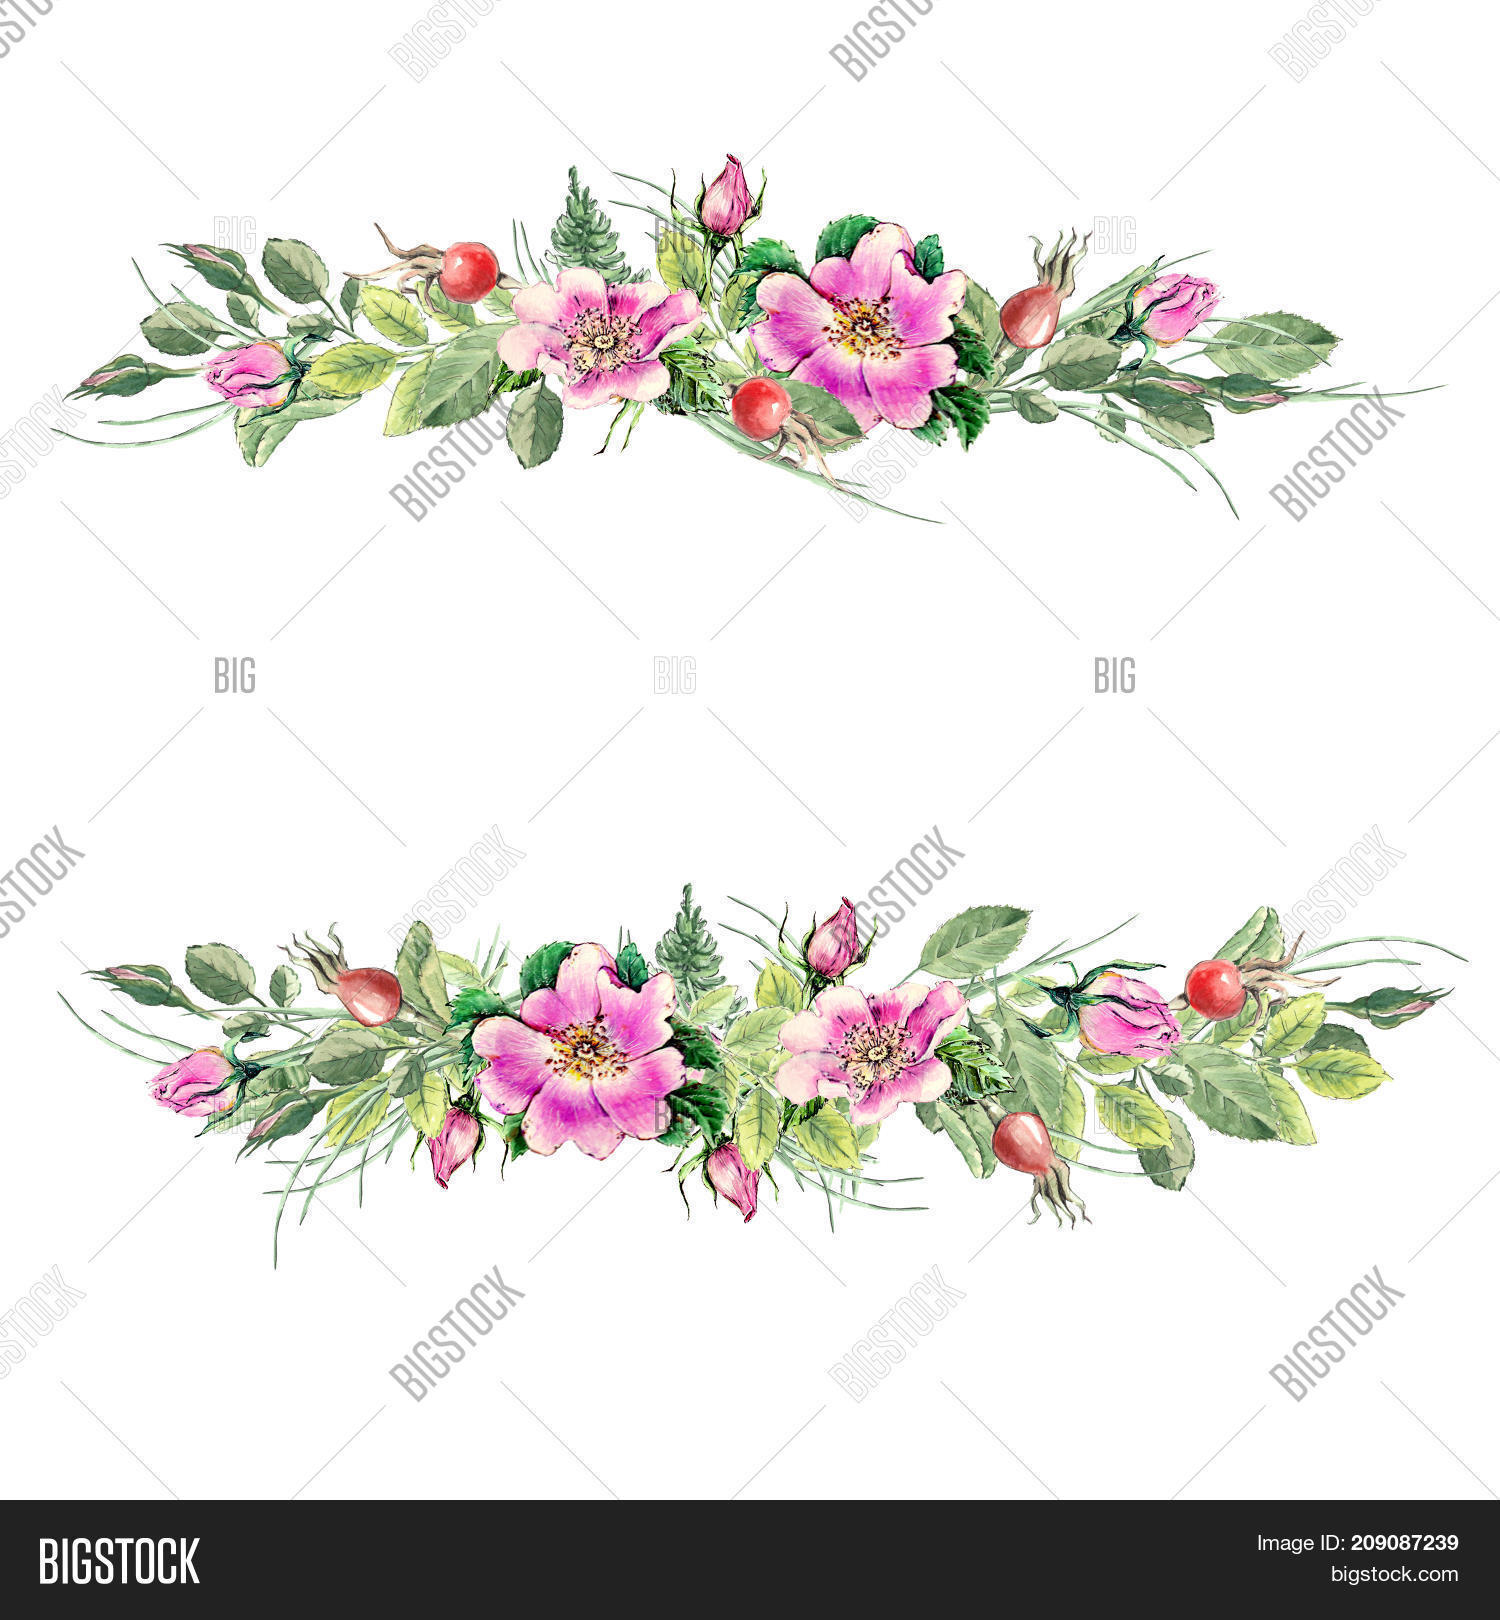 Banner Flowering Pink Image Photo Free Trial Bigstock